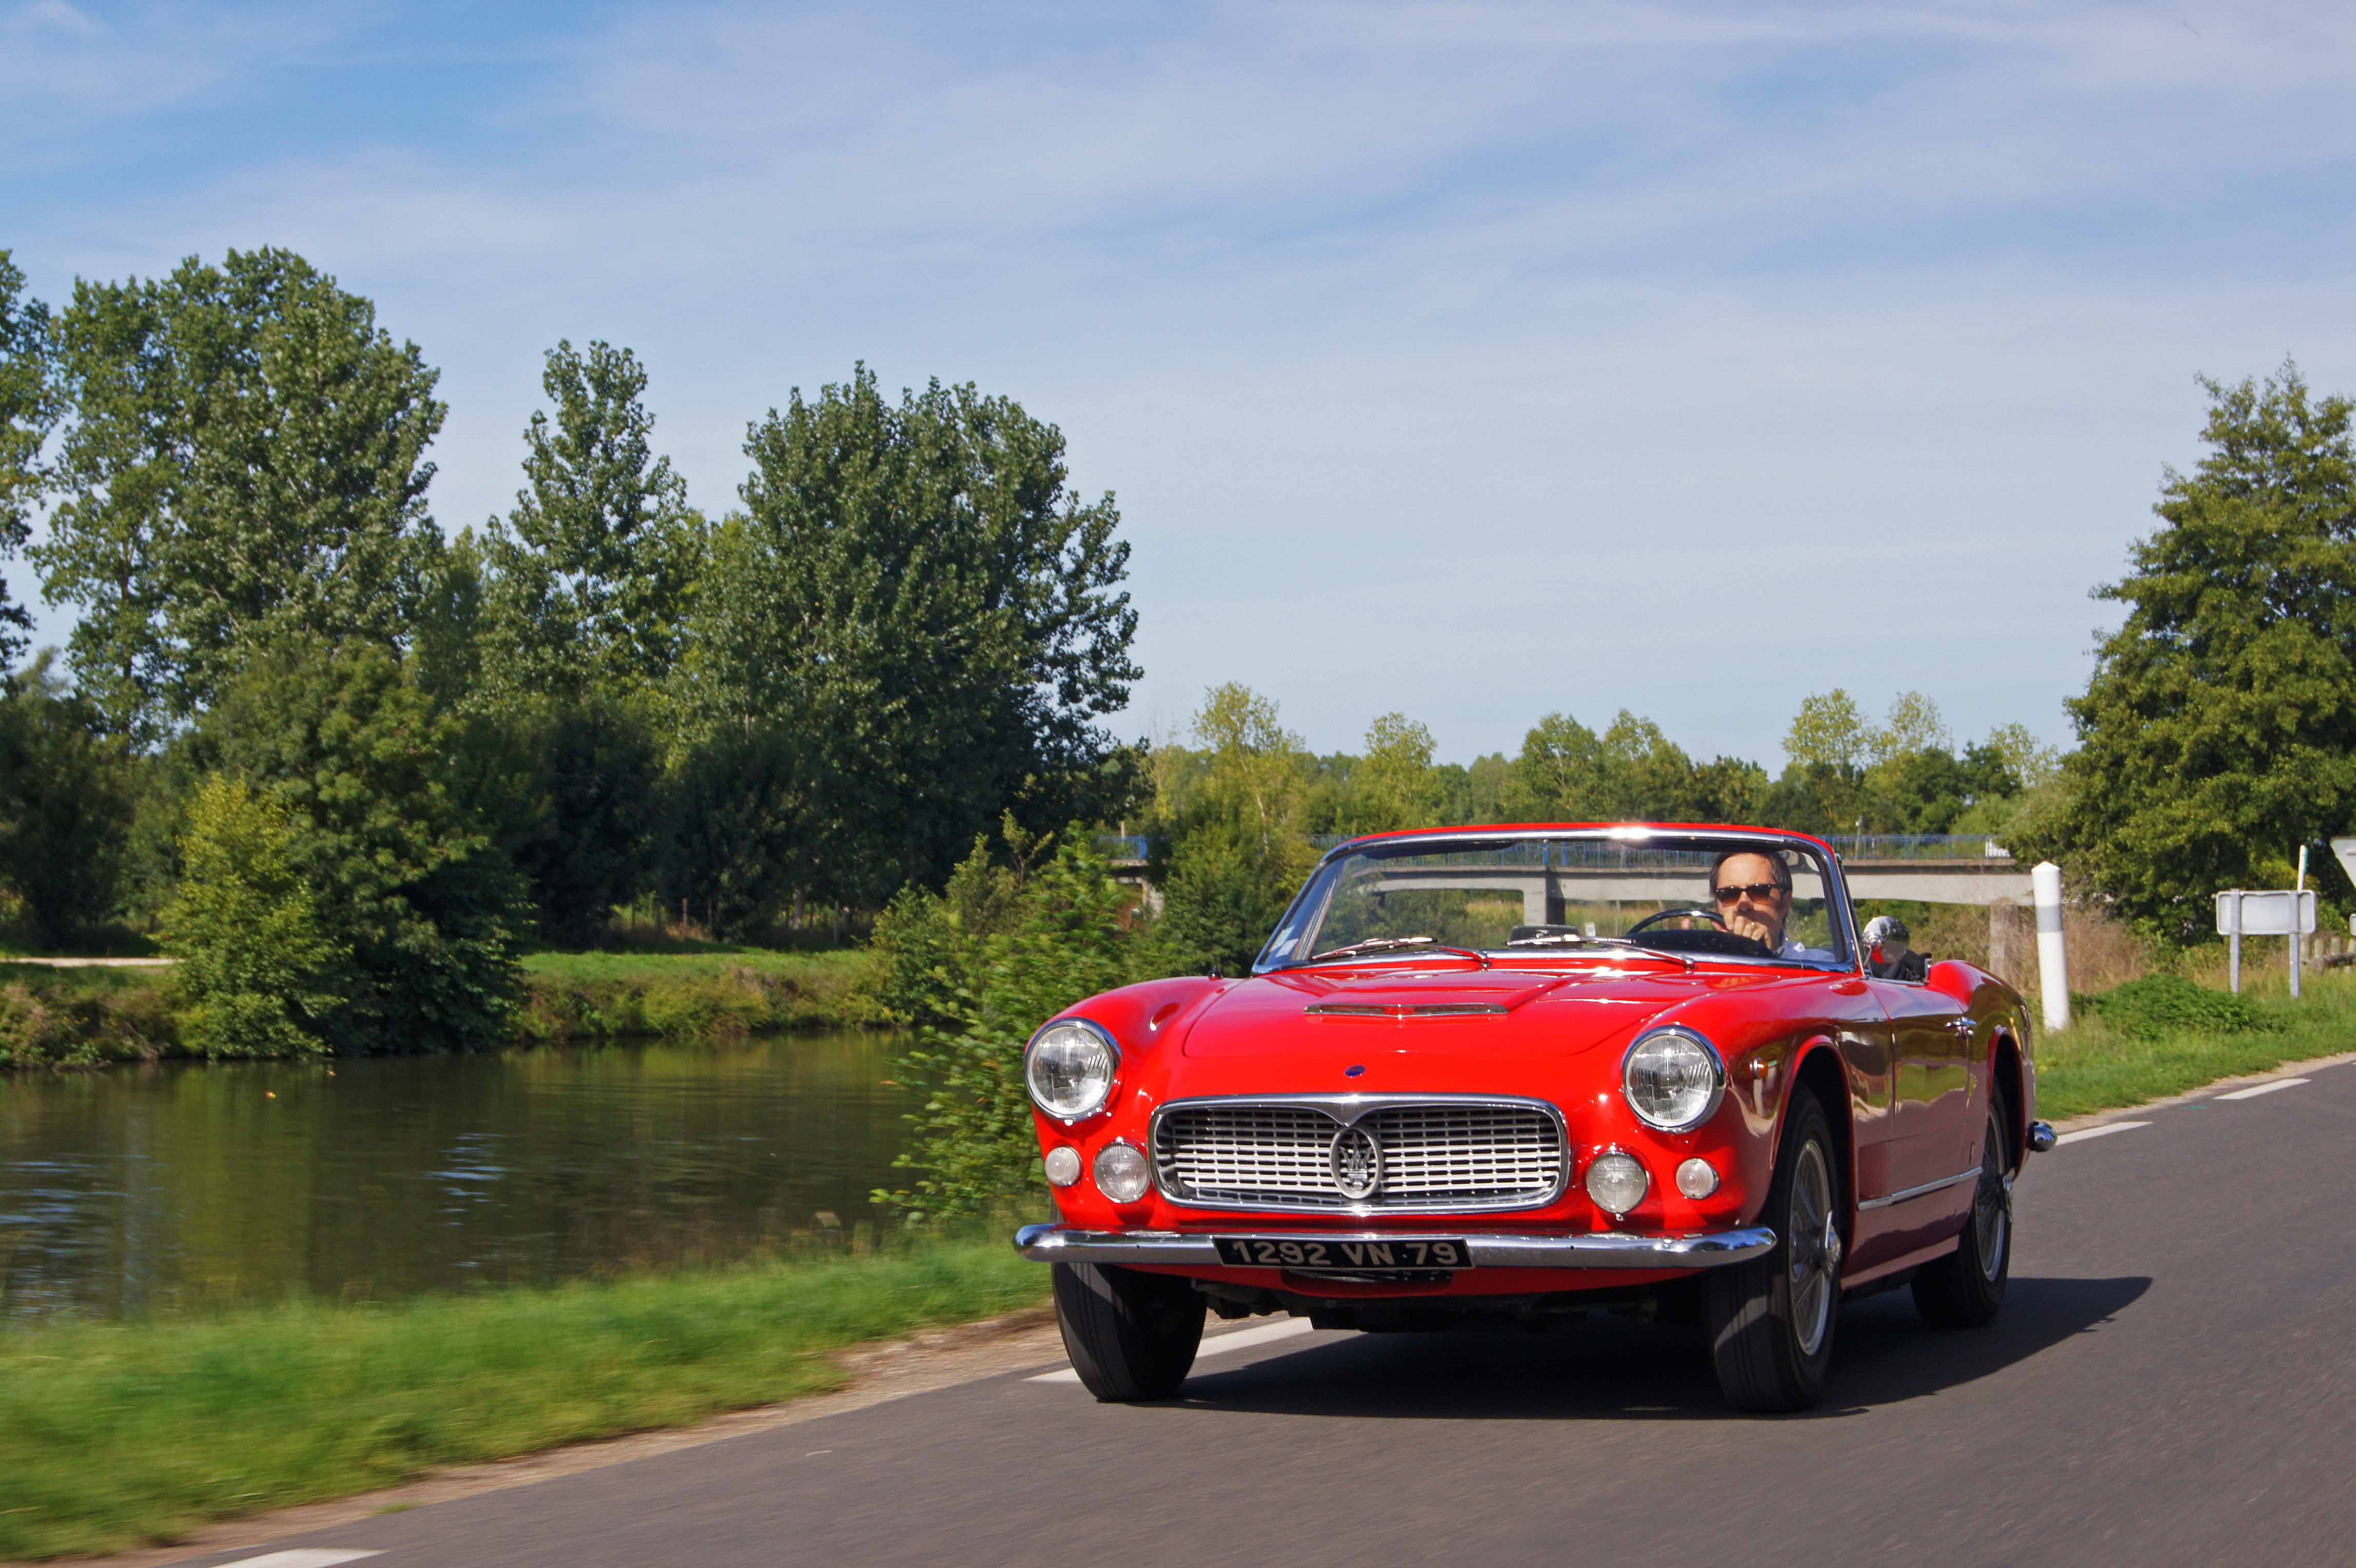 Maserati-3500-GT-Spyder-rouge-3-4-avant-gauche-travelling.jpg